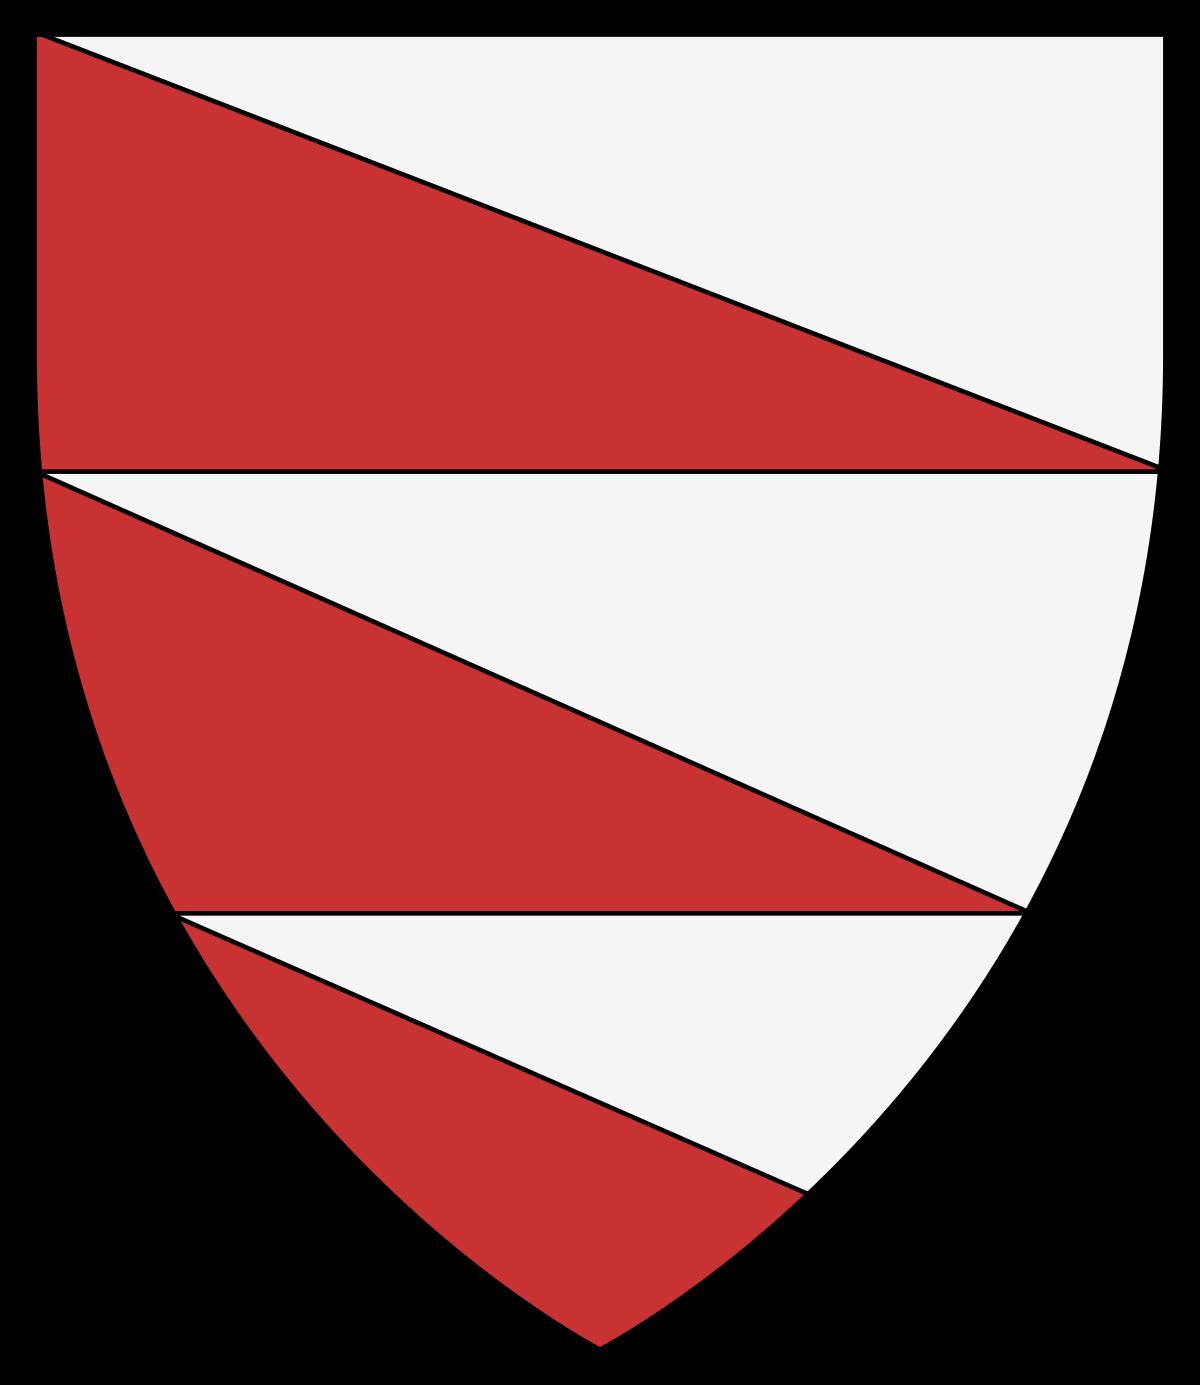 Stephen v b thory. Clipart castle transylvania